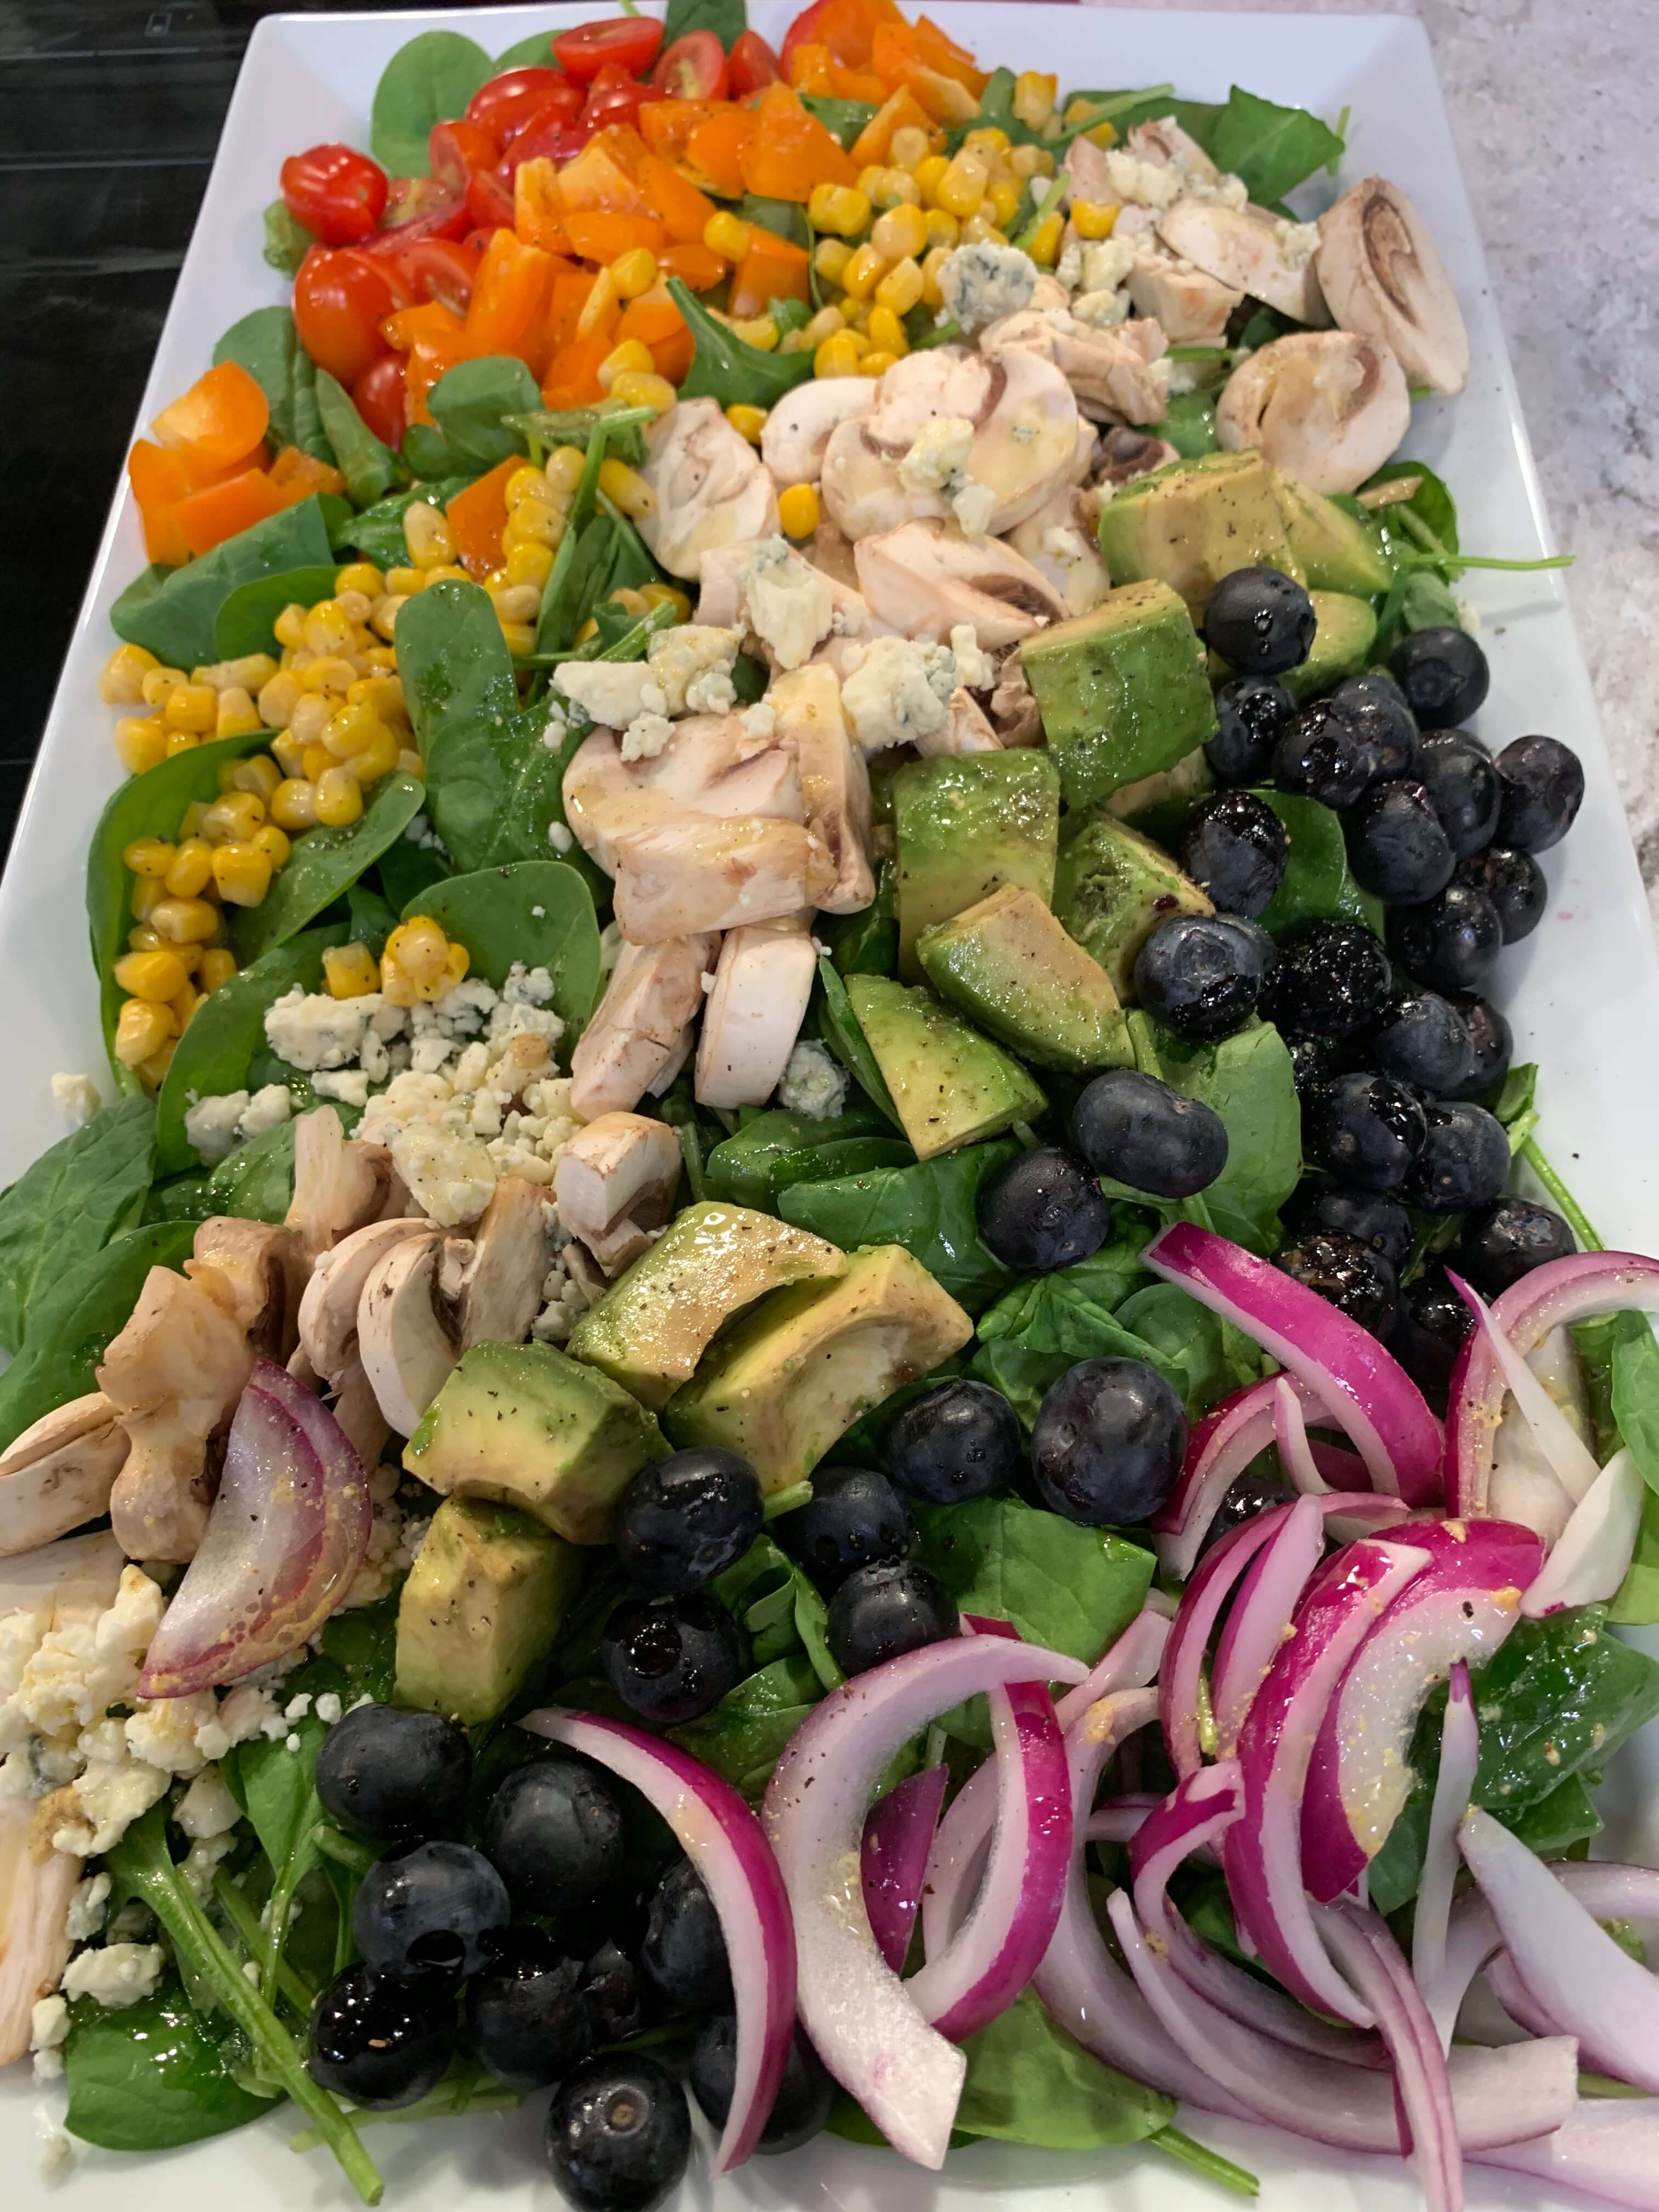 Rainbow Salad with White Mushrooms